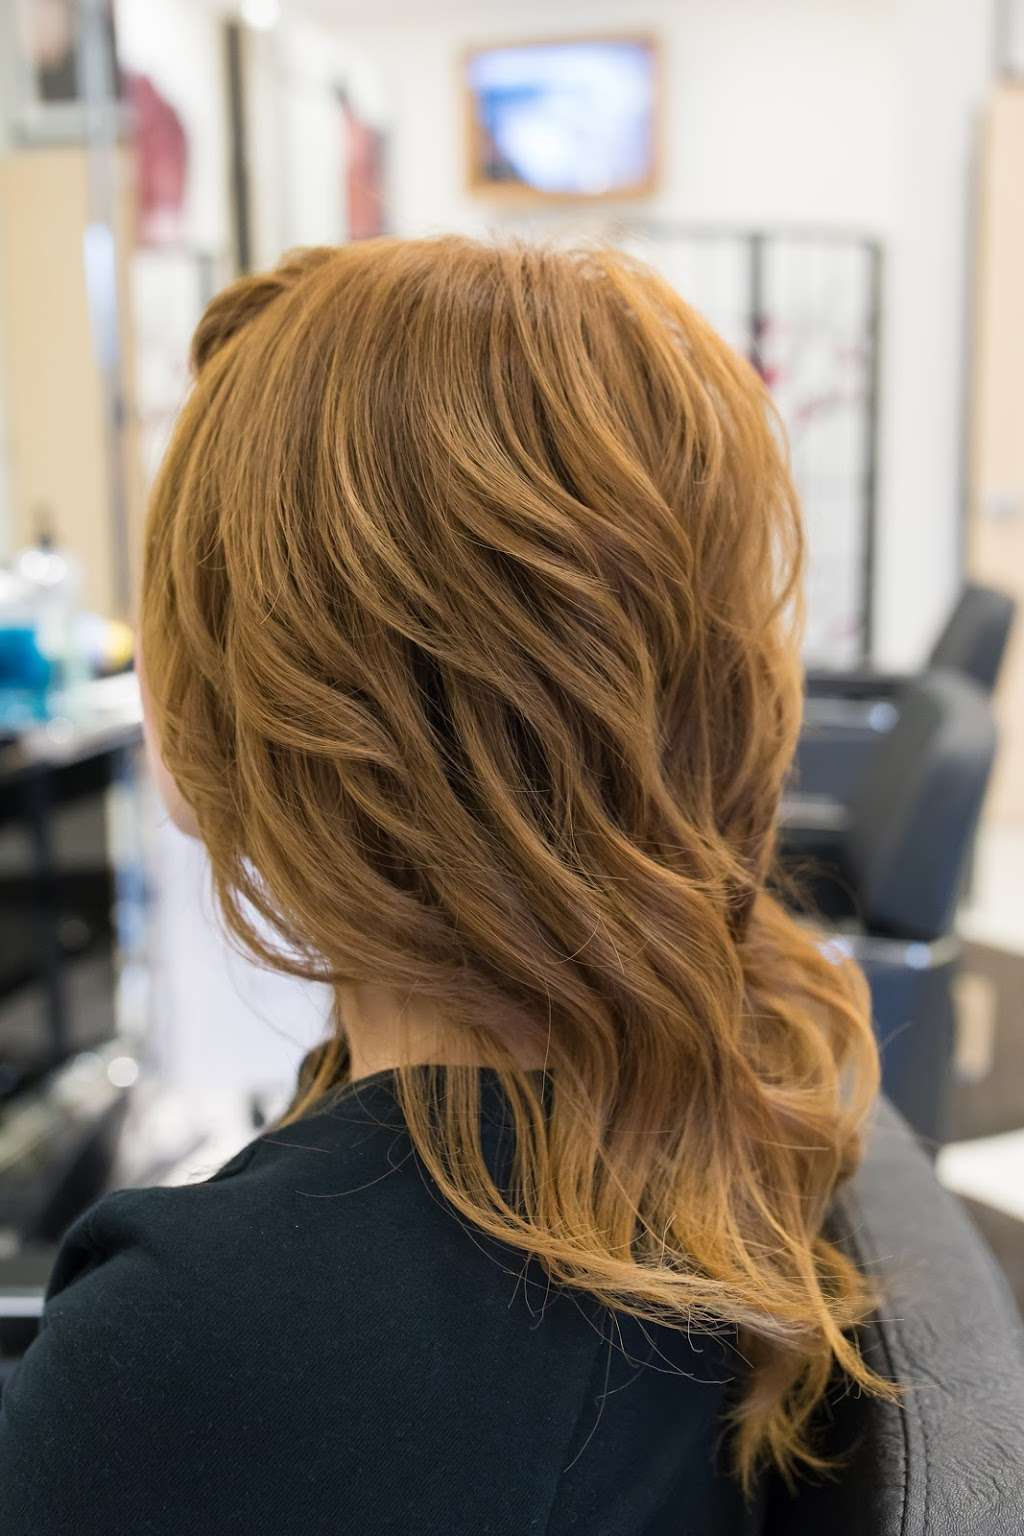 Cozy Hair Salon - hair care  | Photo 1 of 10 | Address: 2814 S Shepherd Dr, Houston, TX 77098, USA | Phone: (832) 684-9699